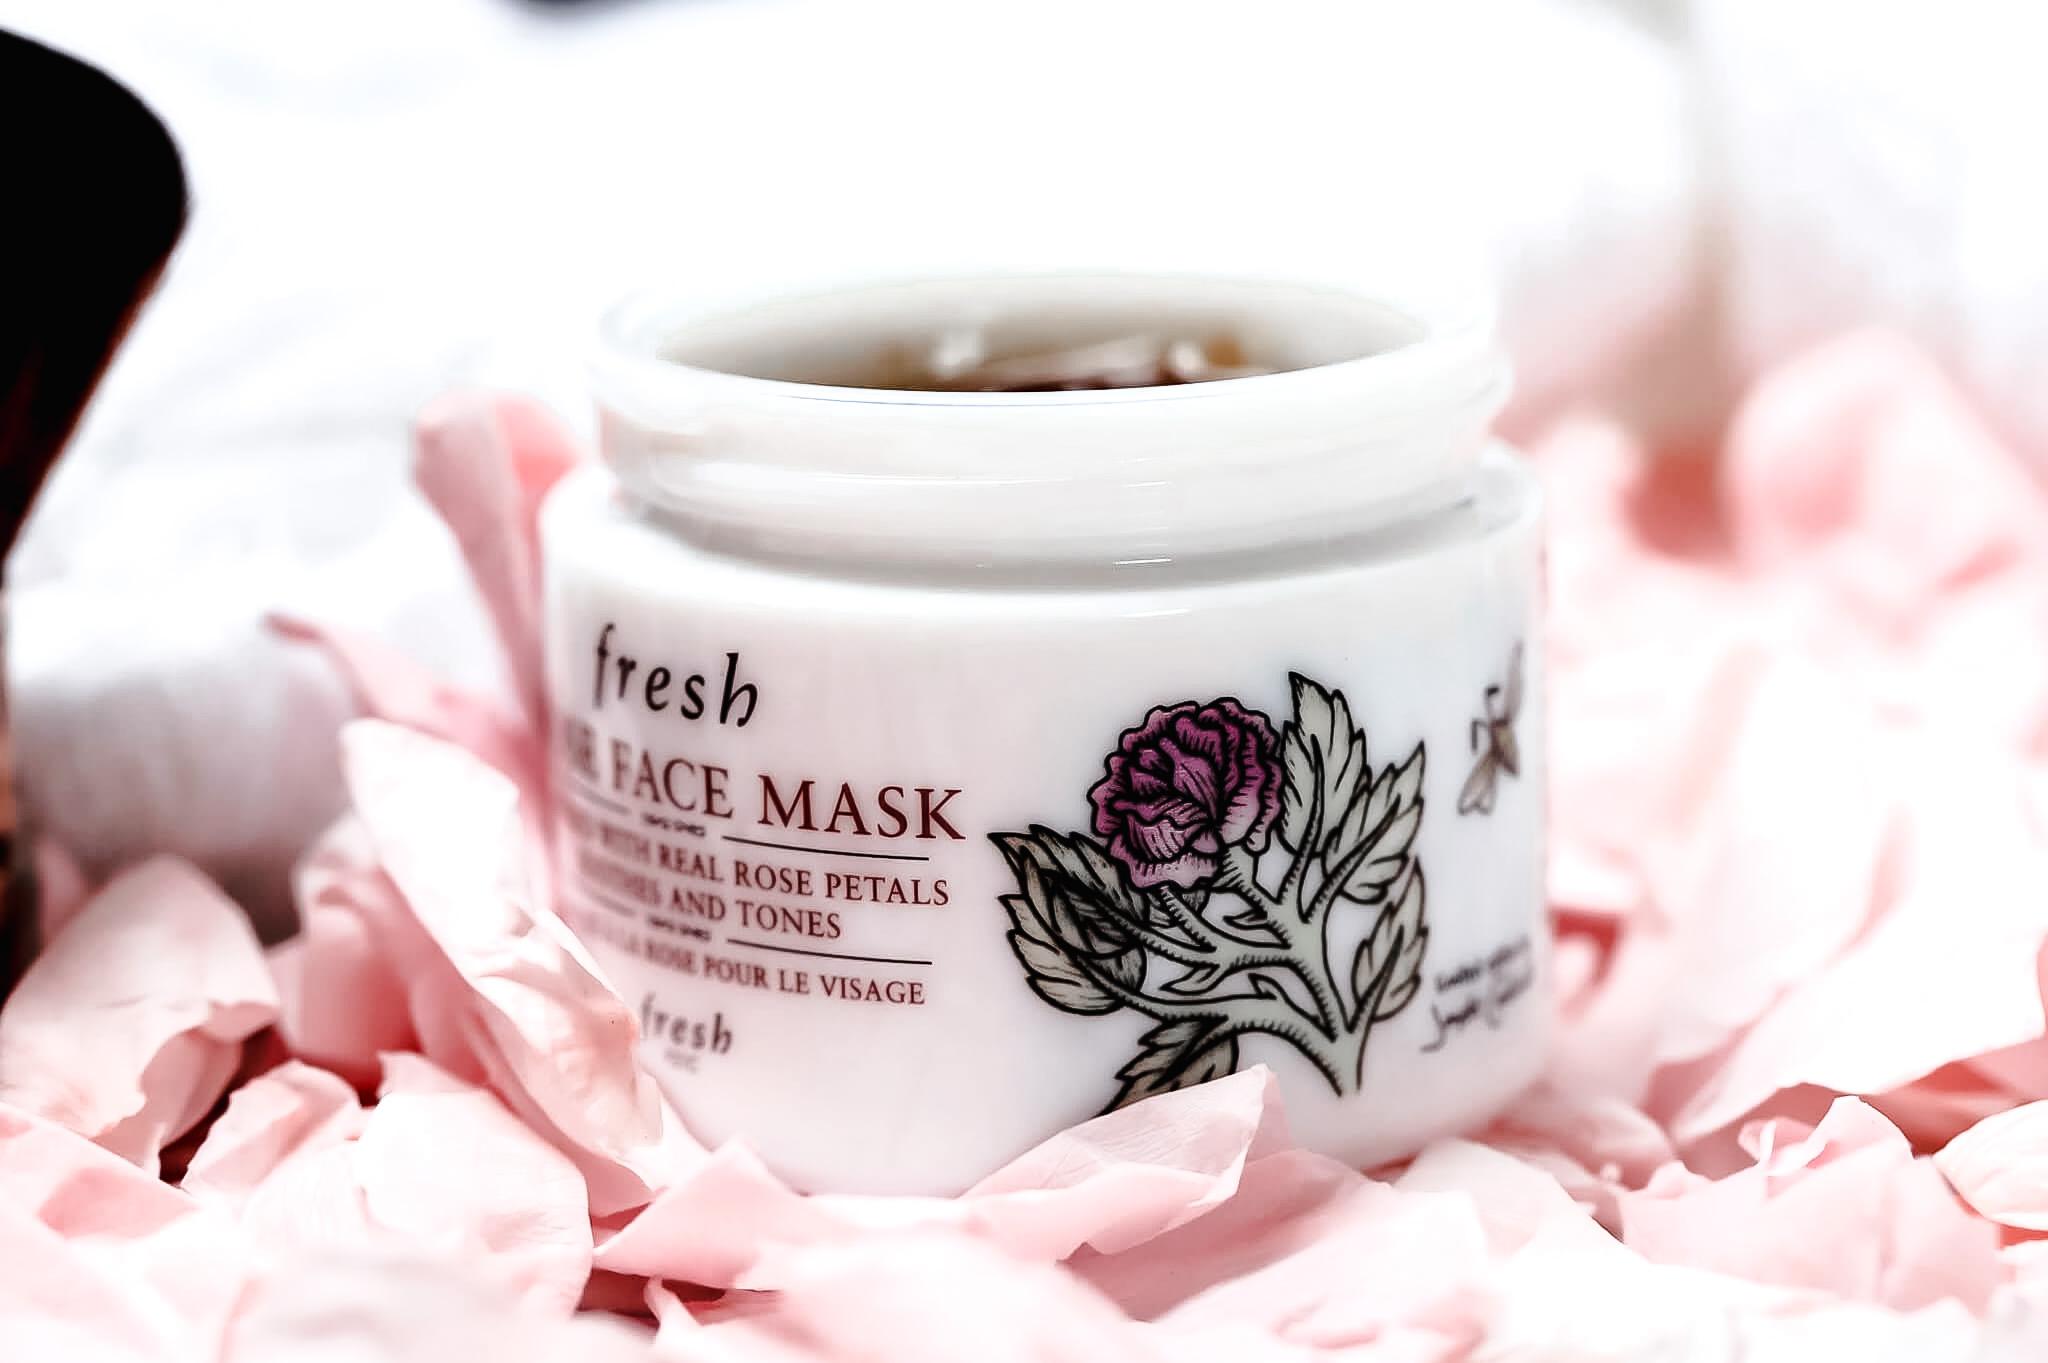 Fresh Rose Masque